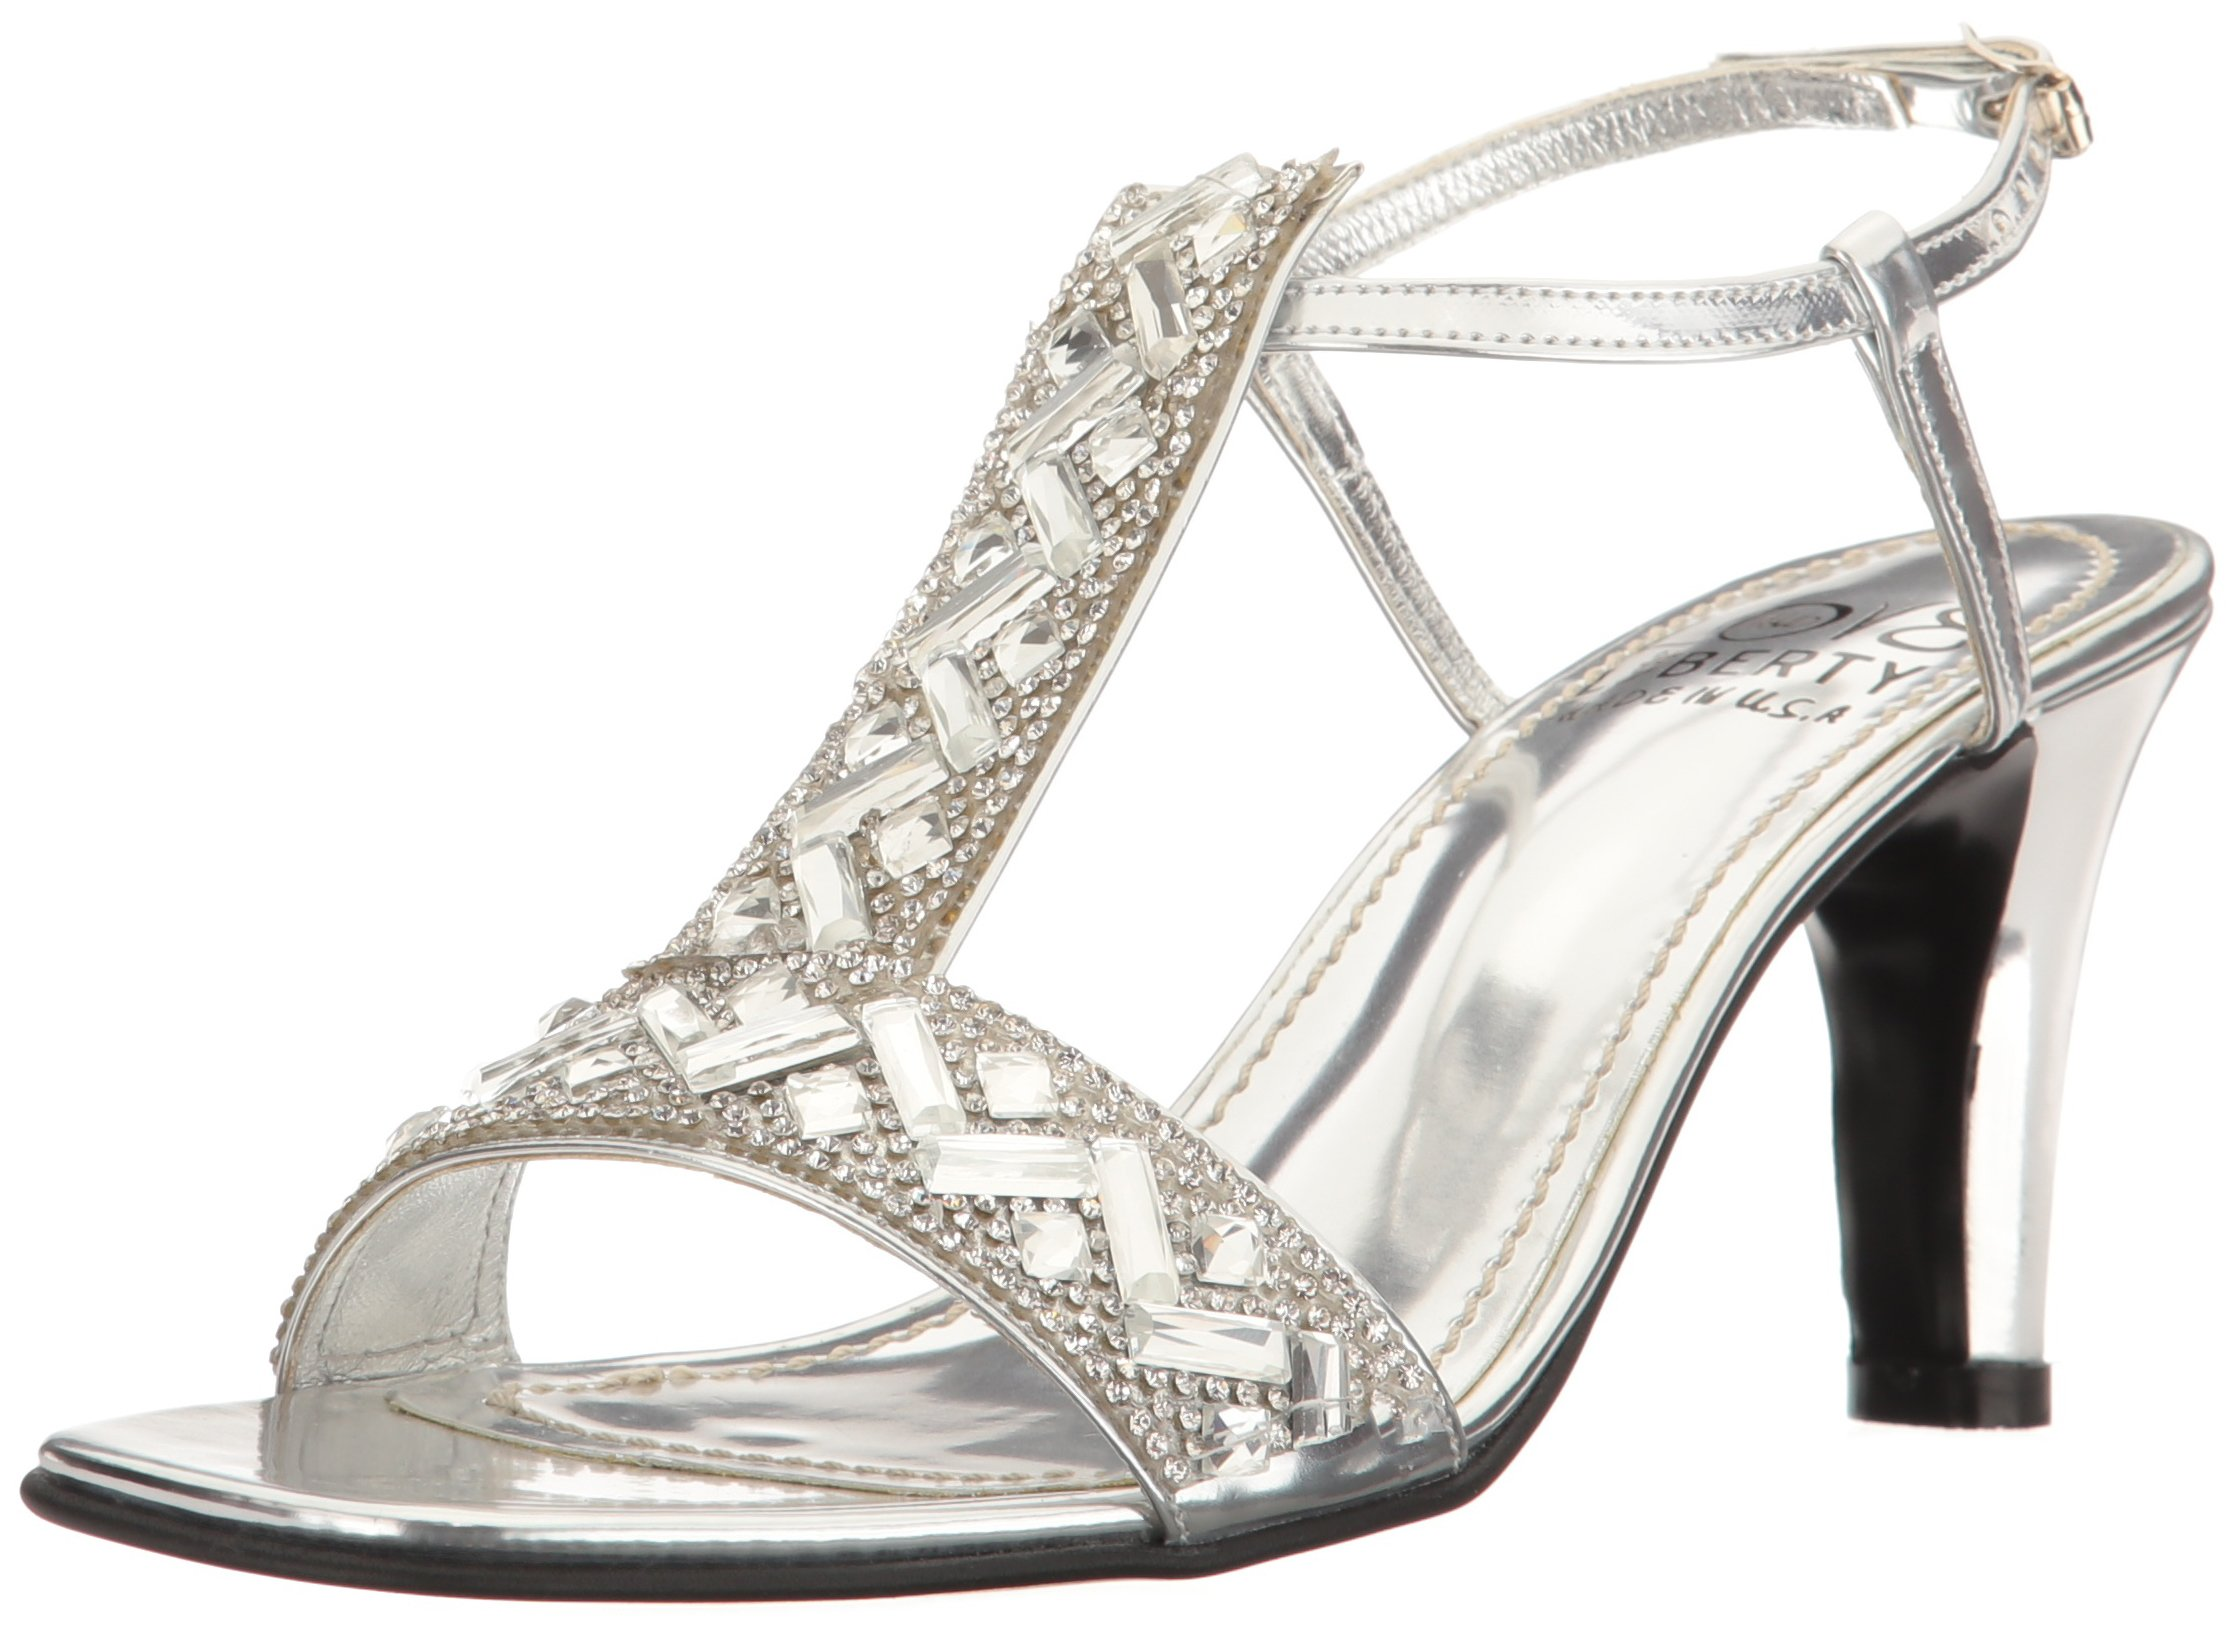 Love & Liberty Women's Savanna-Ll Dress Sandal, Silver, 6 M US